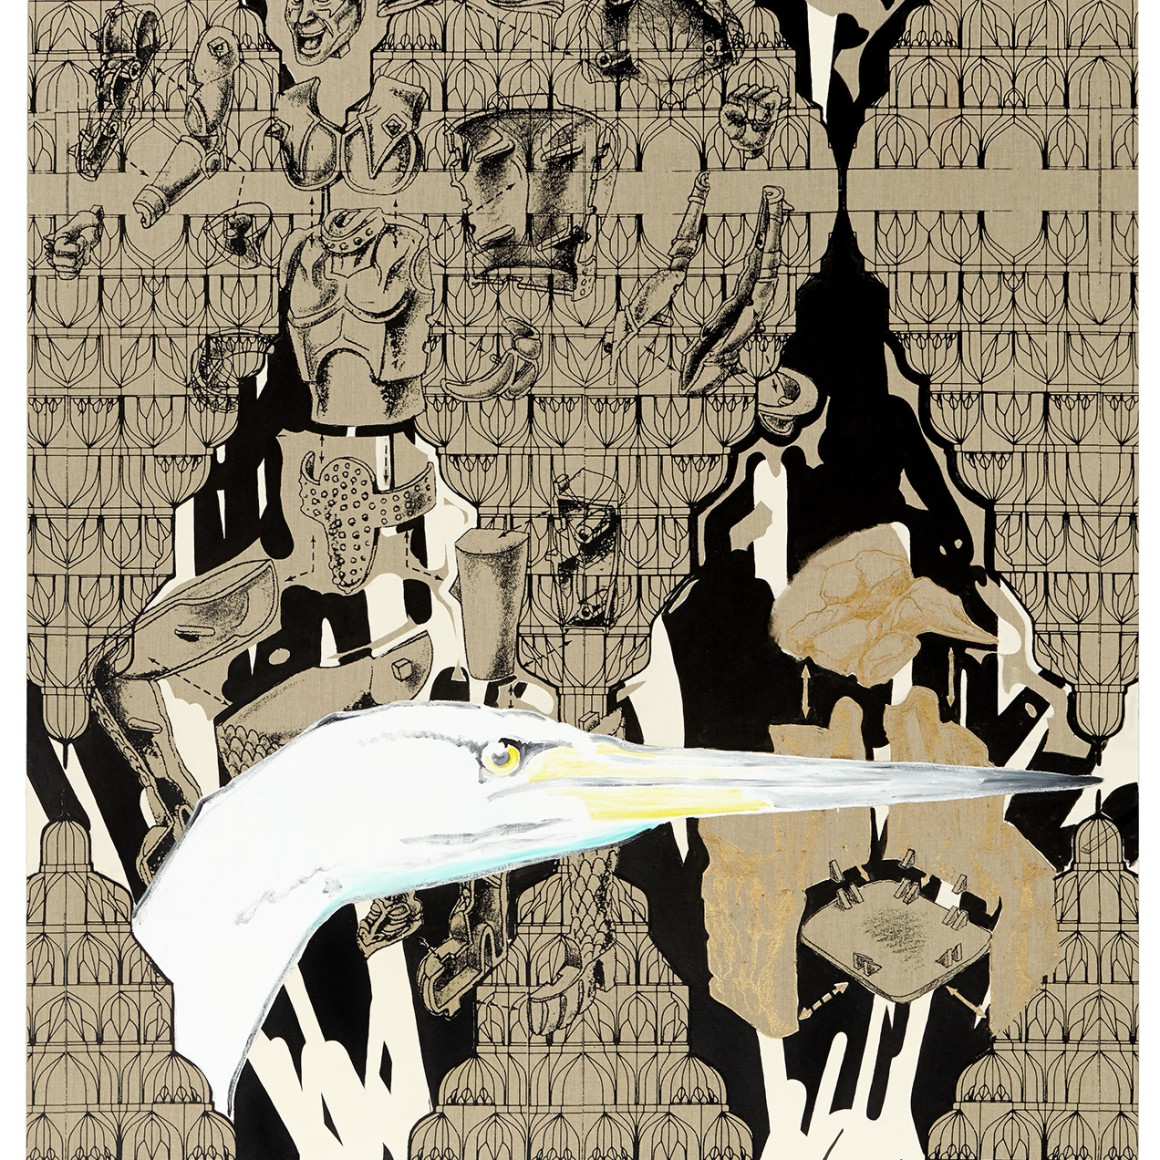 Zhivago Duncan, Undisputed Reality, 2015